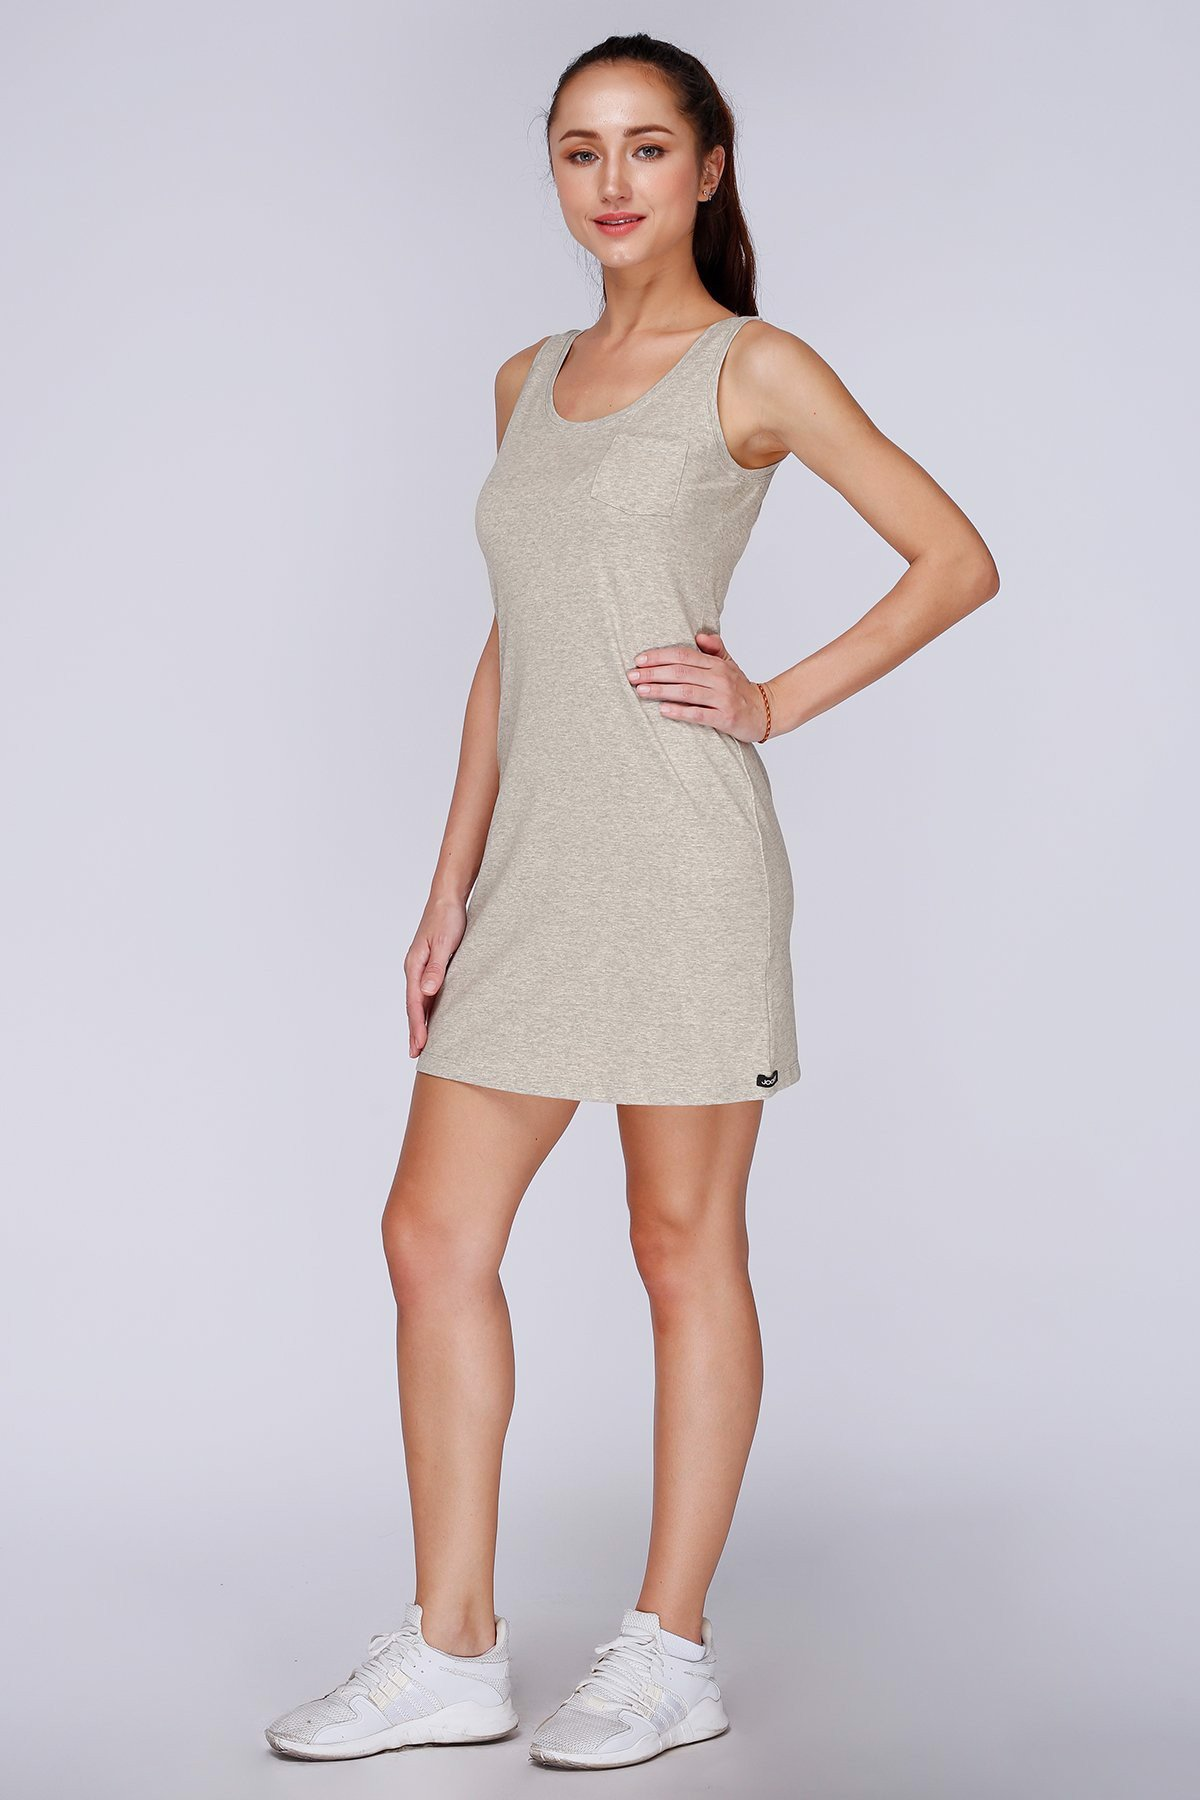 Đầm Jockey Dress nữ Cotton